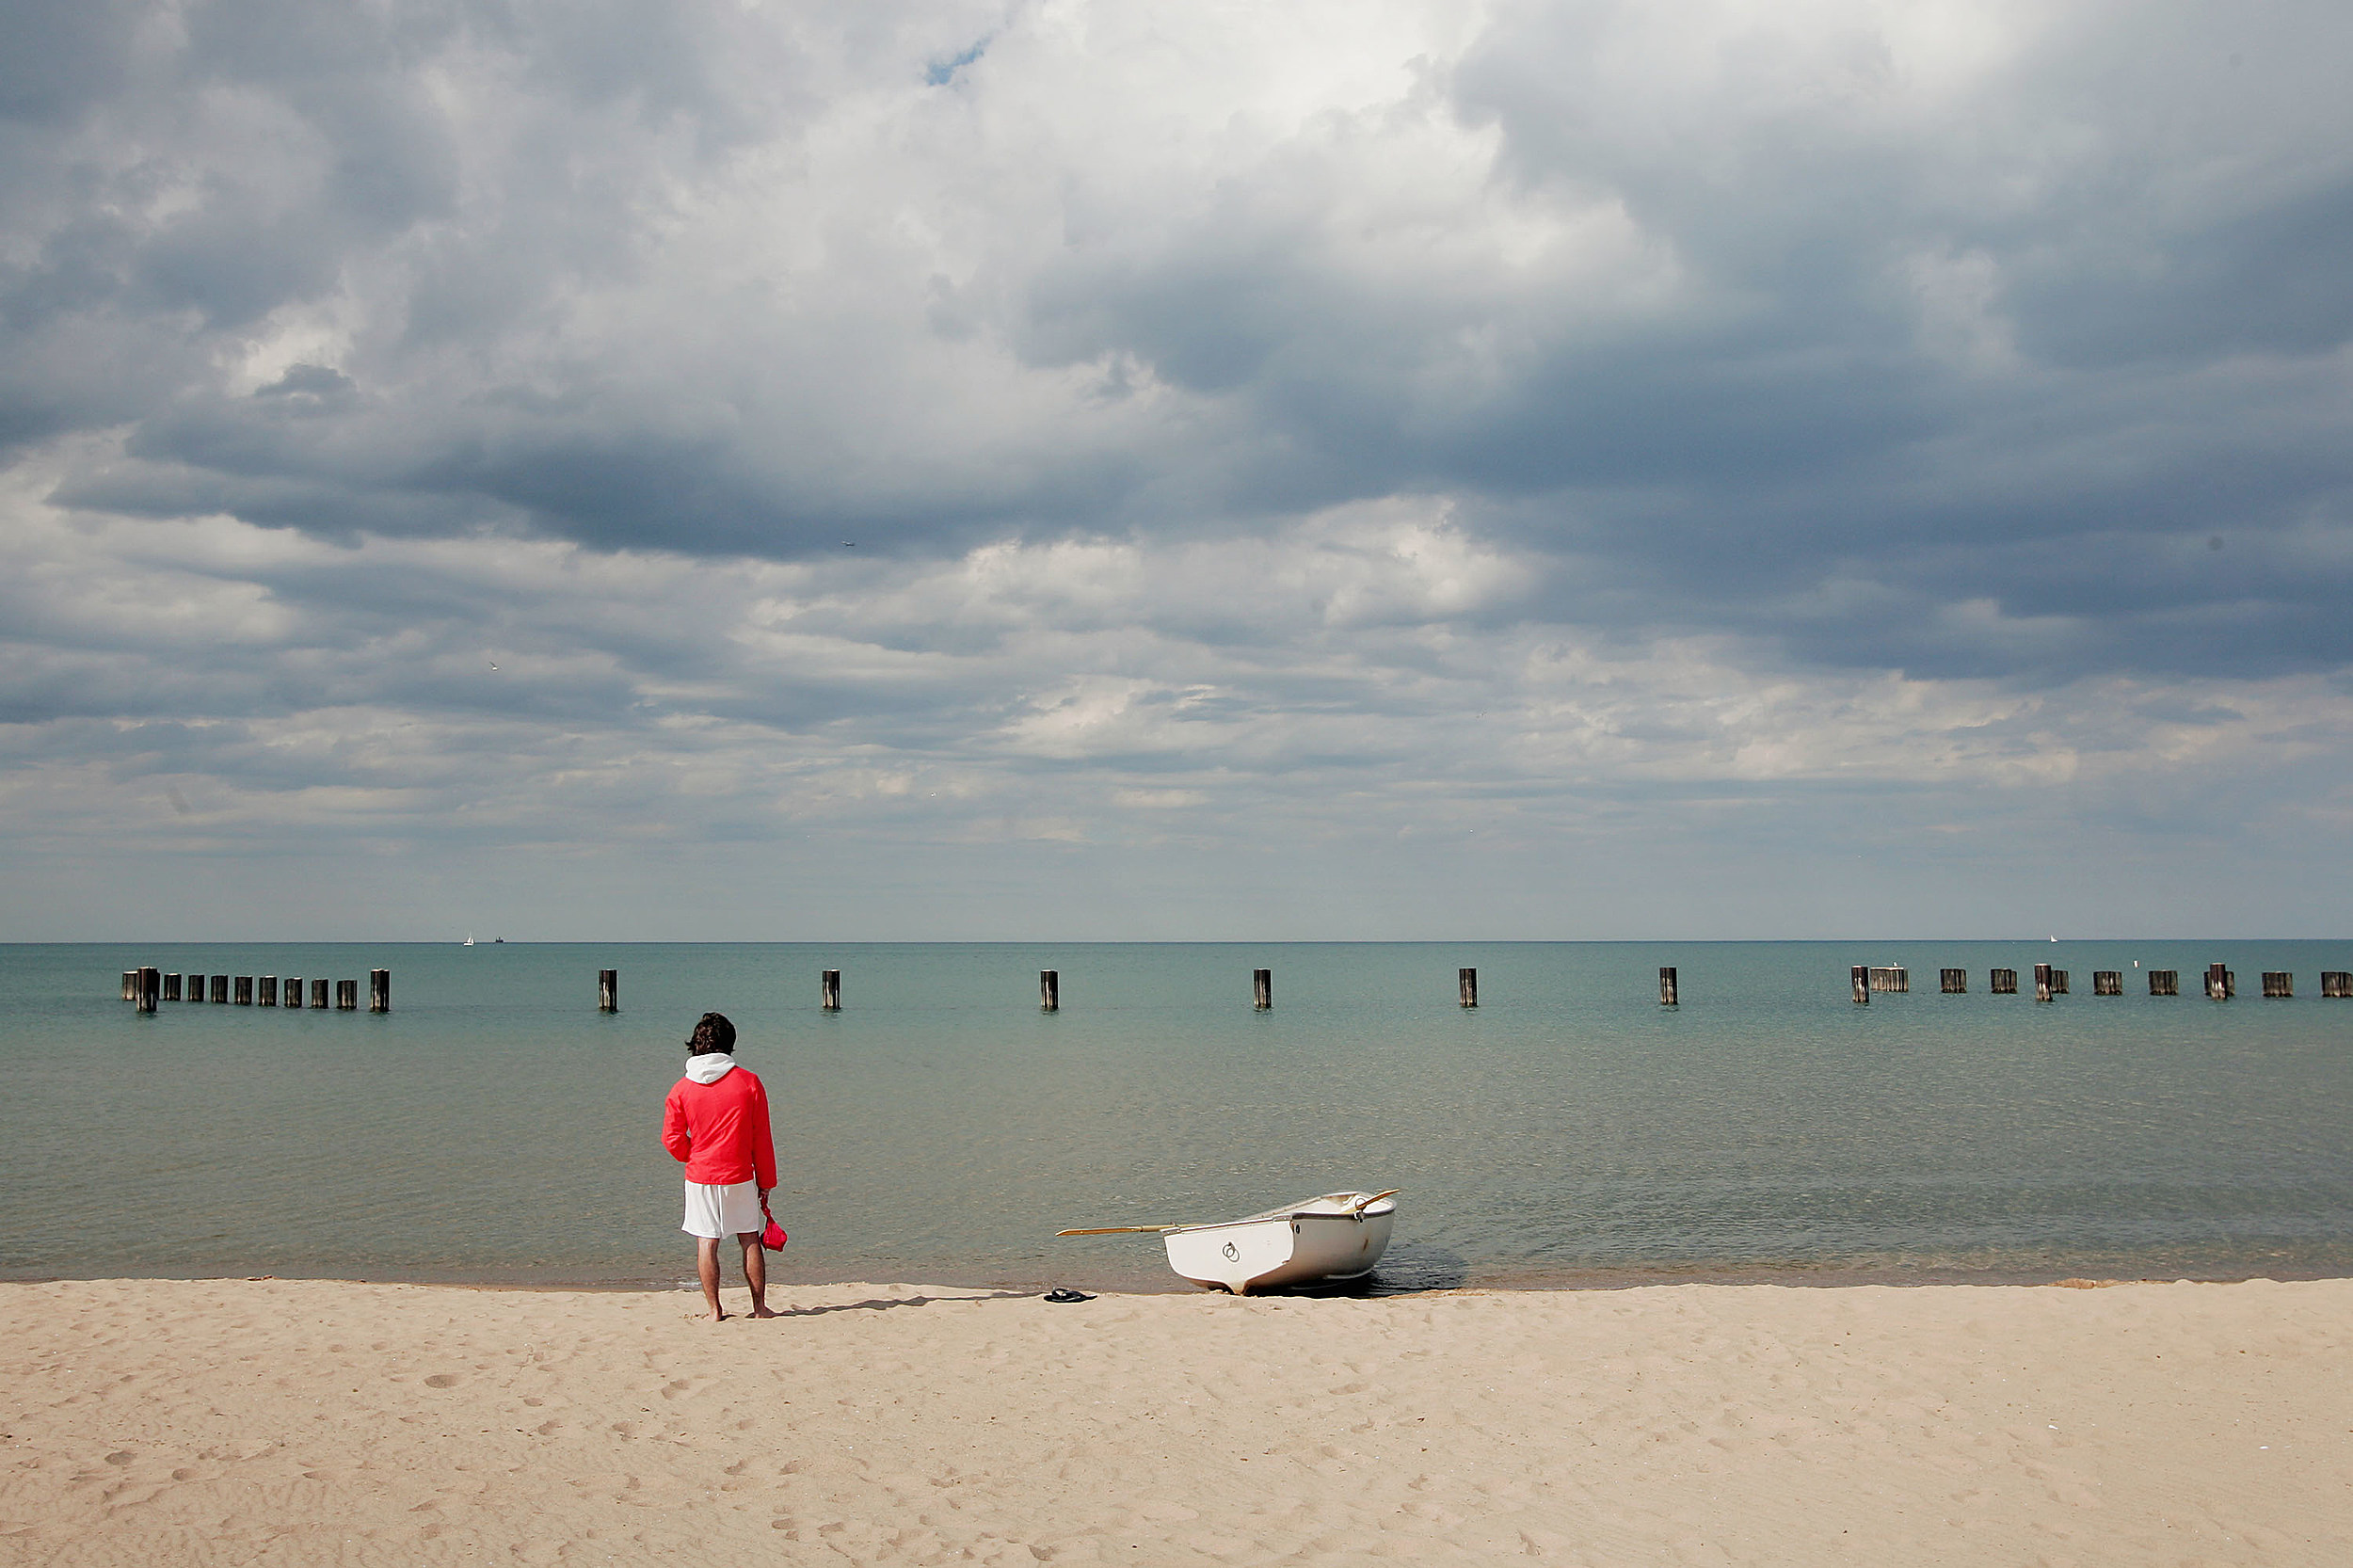 Public Beaches Open In Chicago